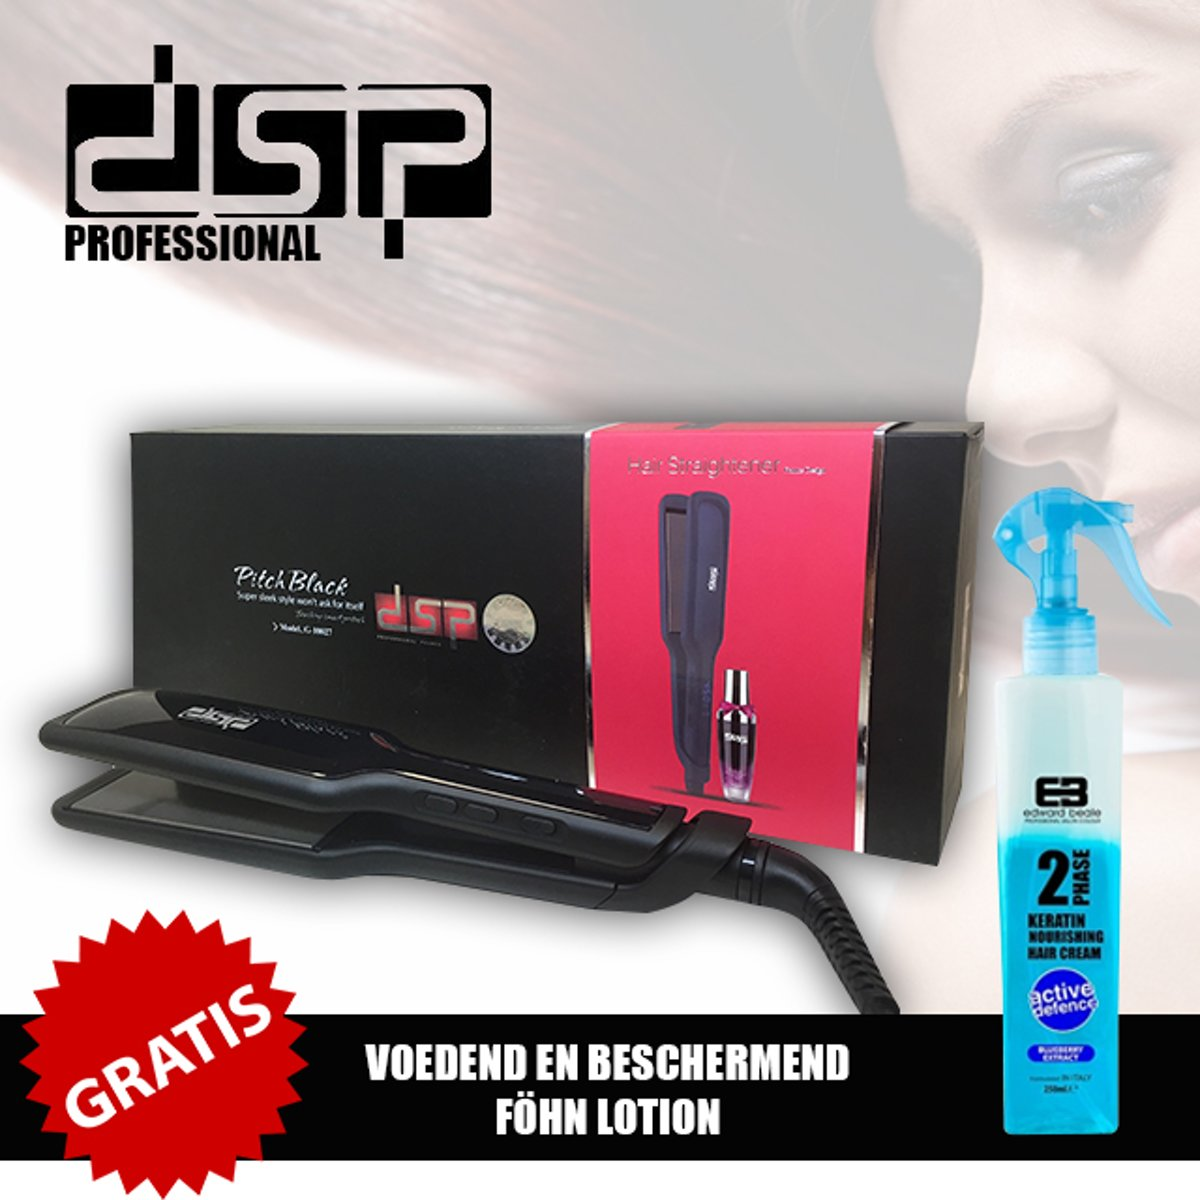 DSP Professional Pitch black Haar Stijltang G-10027 + Gratis Voedend En Beschermend Fohn Lotion